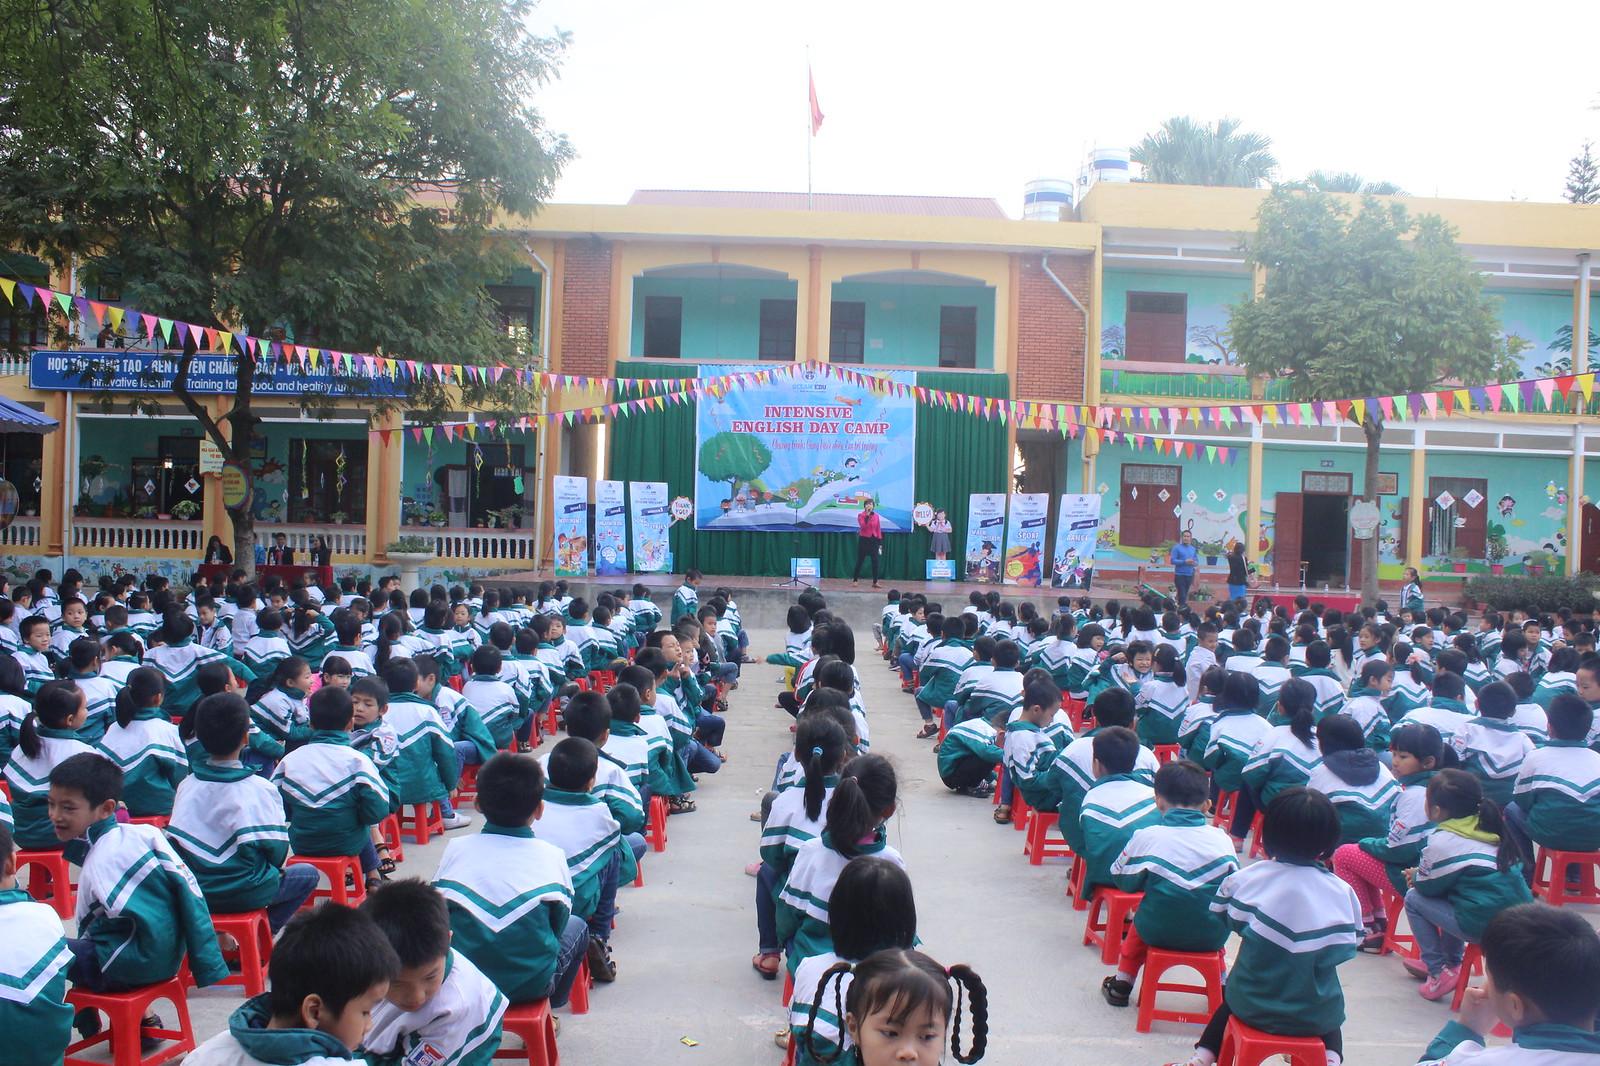 Ocean Edu Intensive English Day Camp held at Dĩnh Kế, Bắc Giang